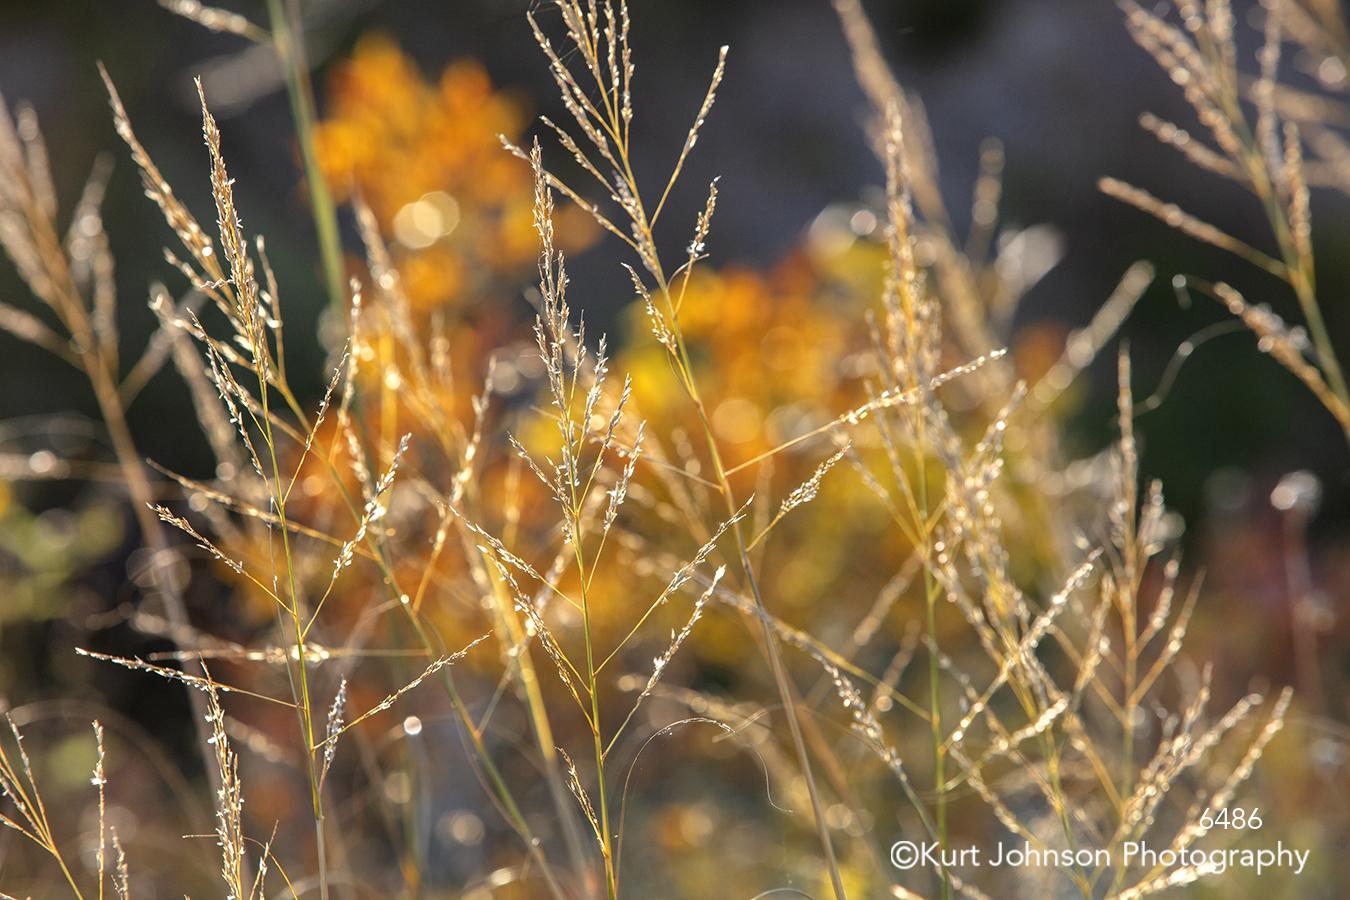 gold brown wheat grass grasses orange flower field wildflowers texture lines pattern